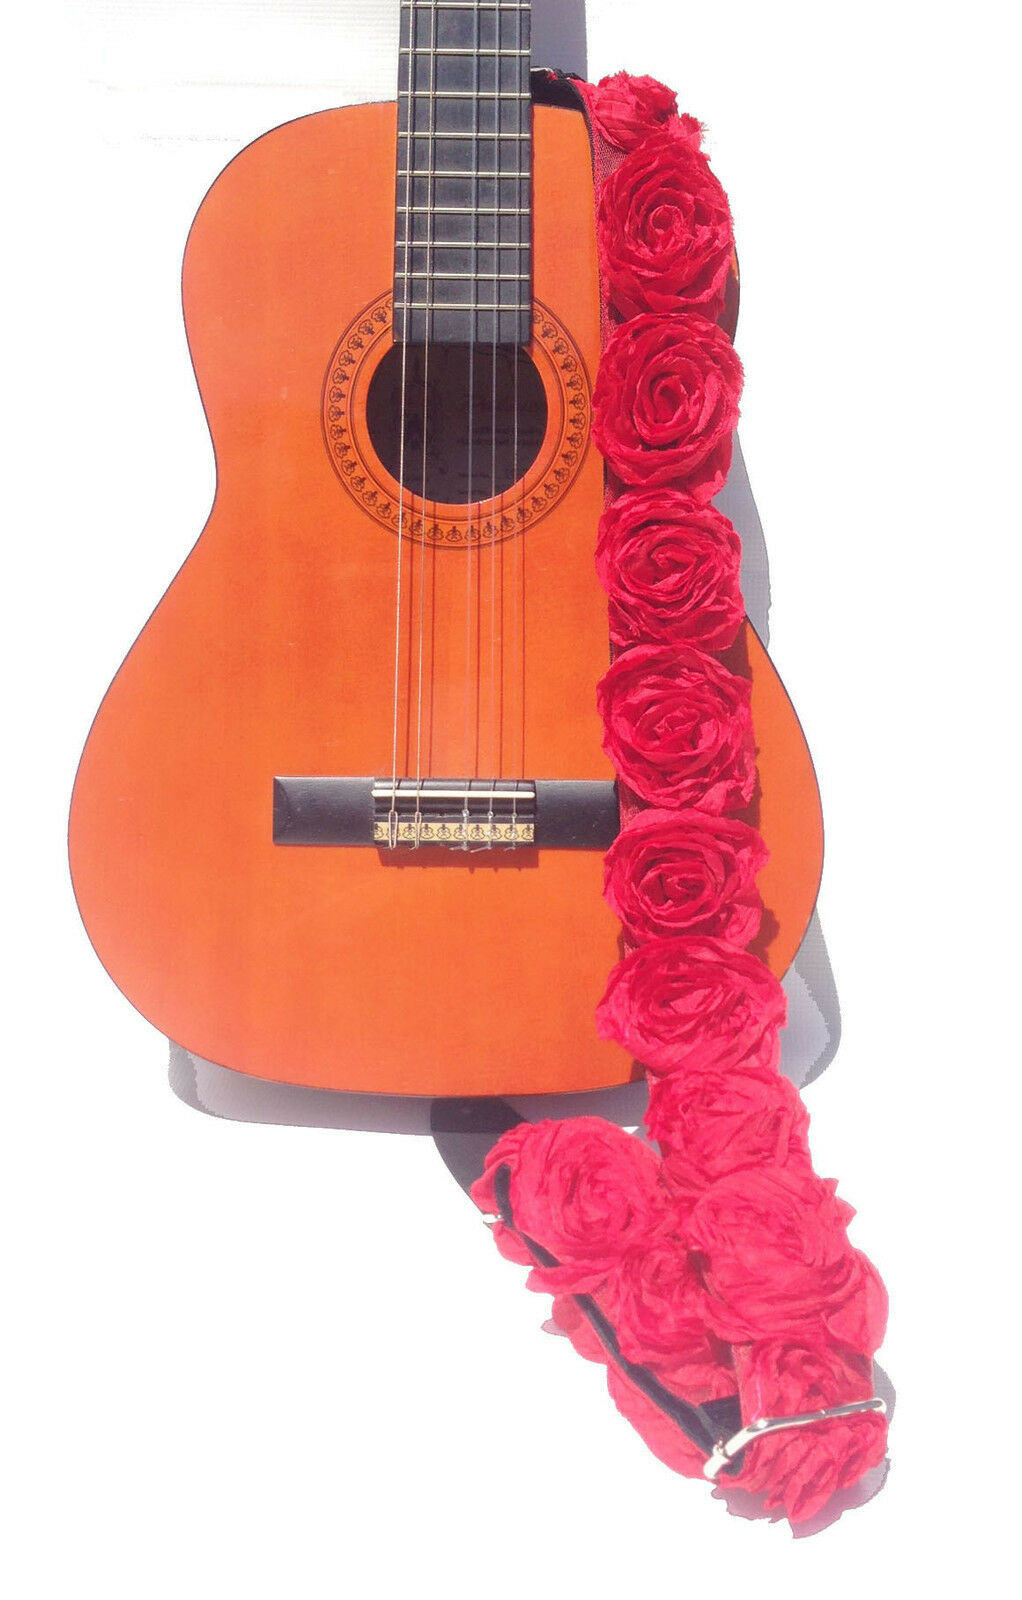 GUITAR STRAP STRAP STRAP KID Talla HOT rosado ORGANZA rosados 2  by  Capturing Couture KID20-HPRS c23189